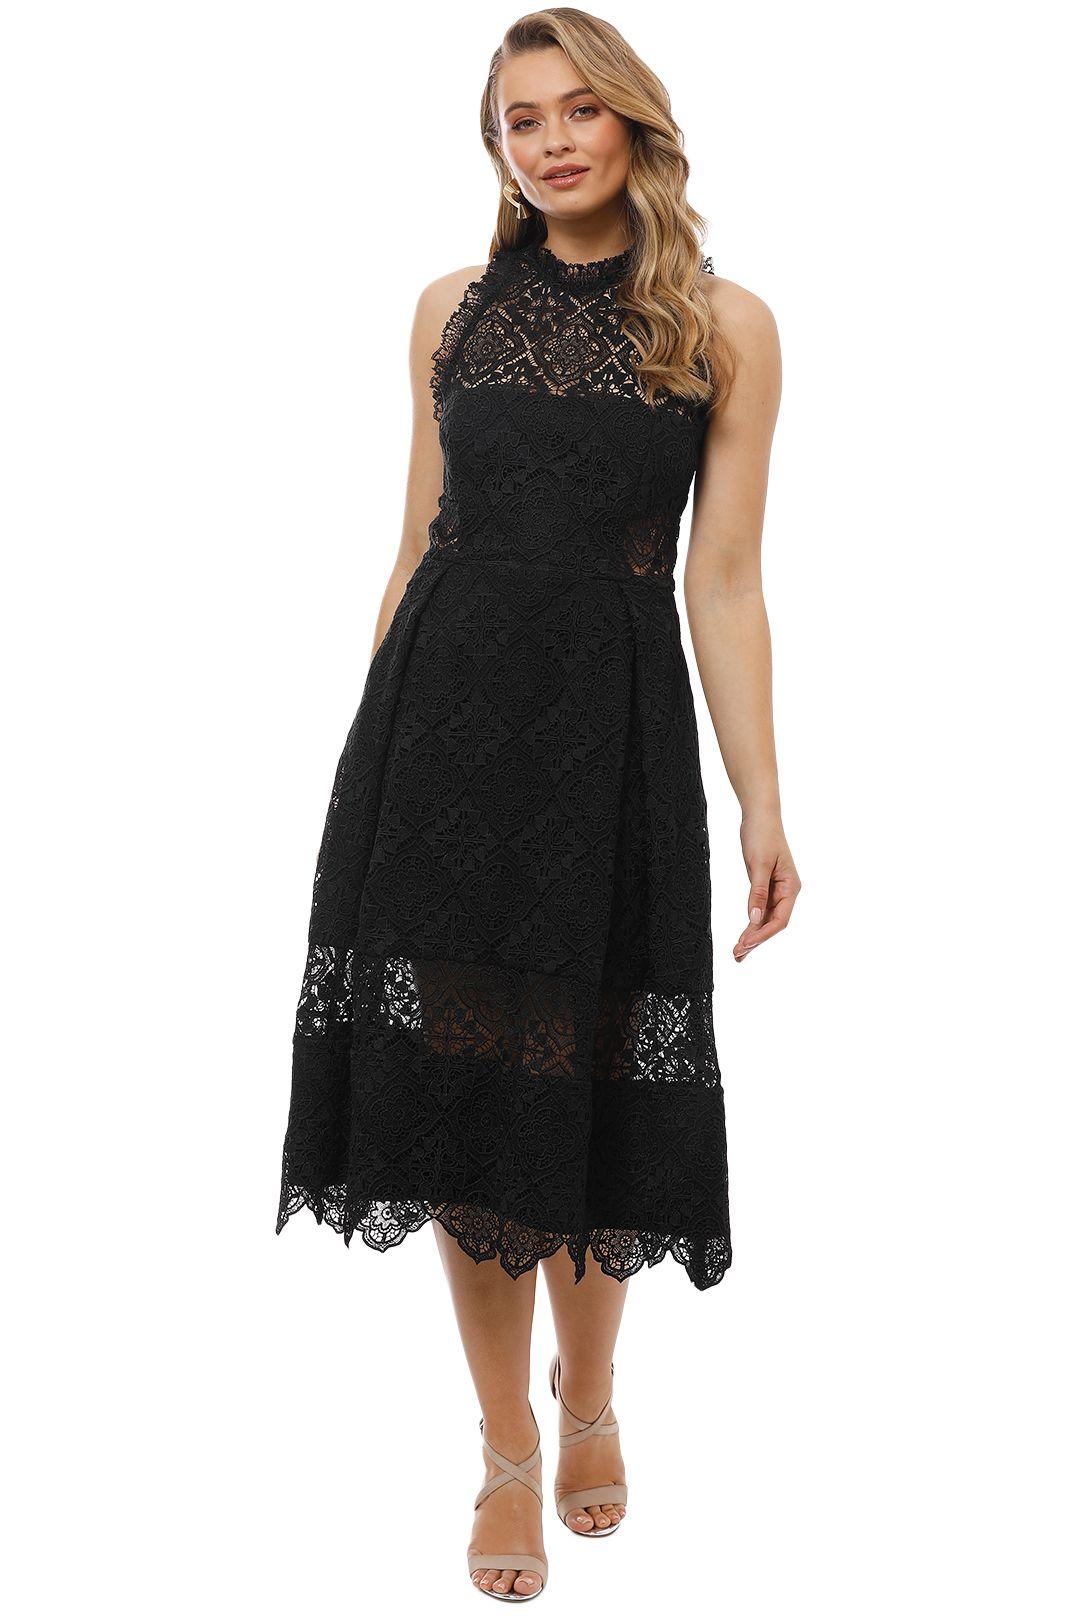 Nicholas the Label - Moroccan Tile Midi Ball Dress - Black - Front